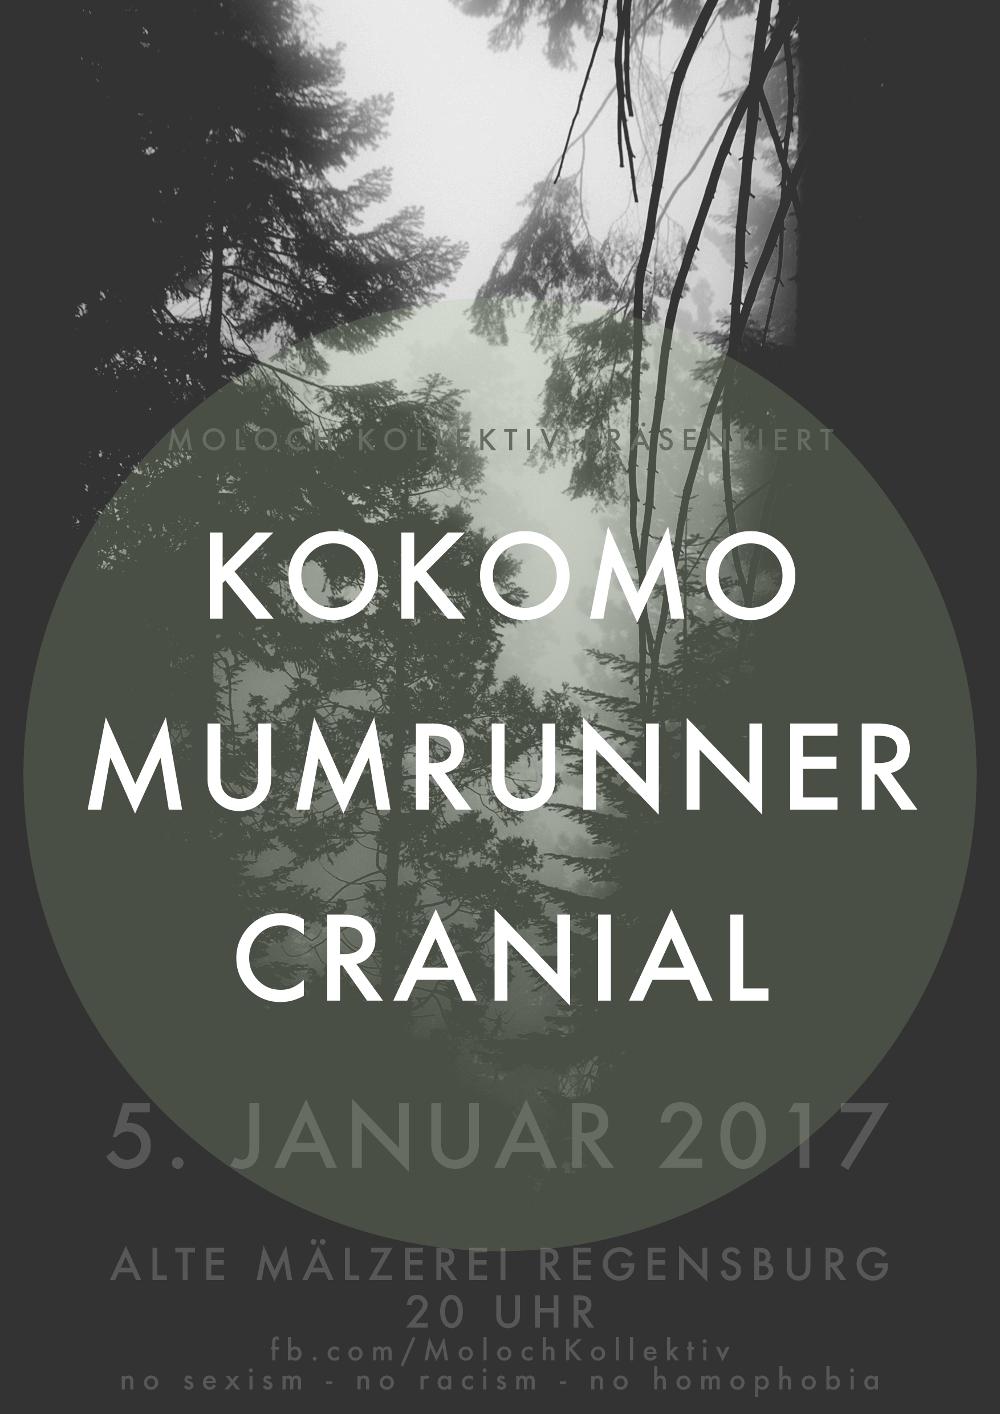 2017-01-05 Kokomo - Mumrunner - Cranial